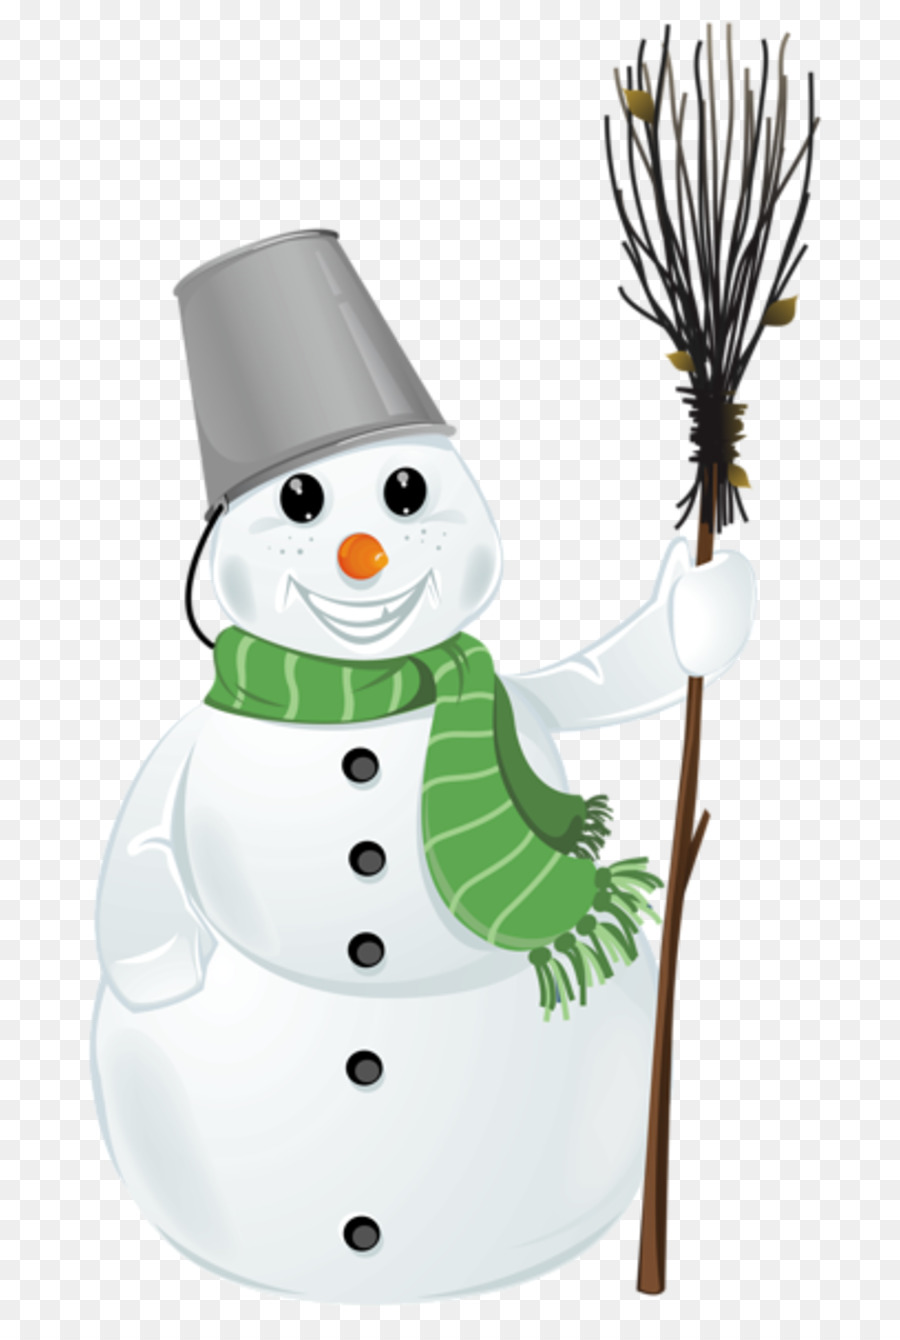 Snowman - Christmas - Christmas Ornament